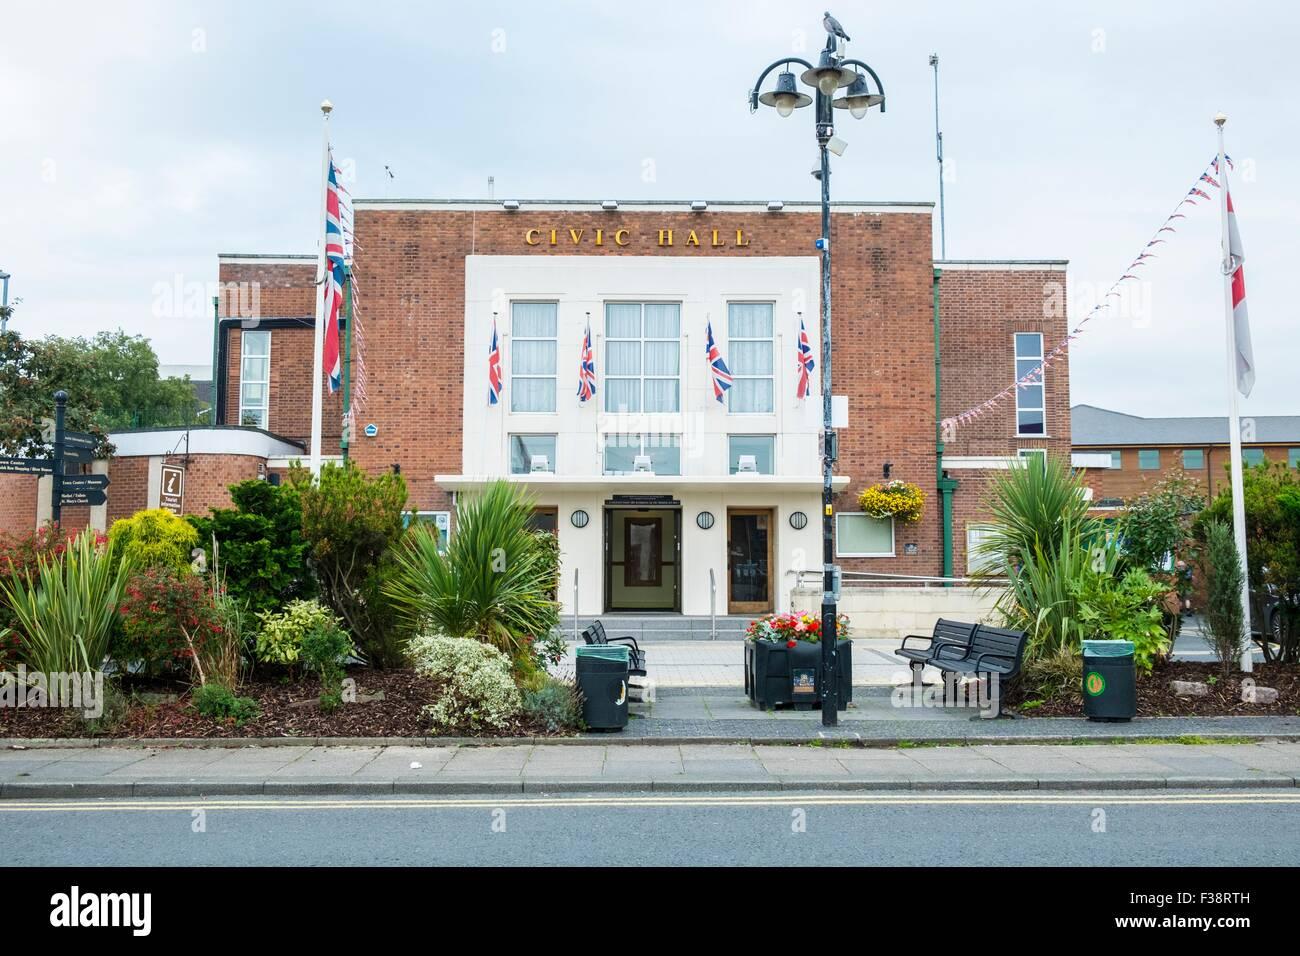 Civic Hall, Nantwich - Stock Image